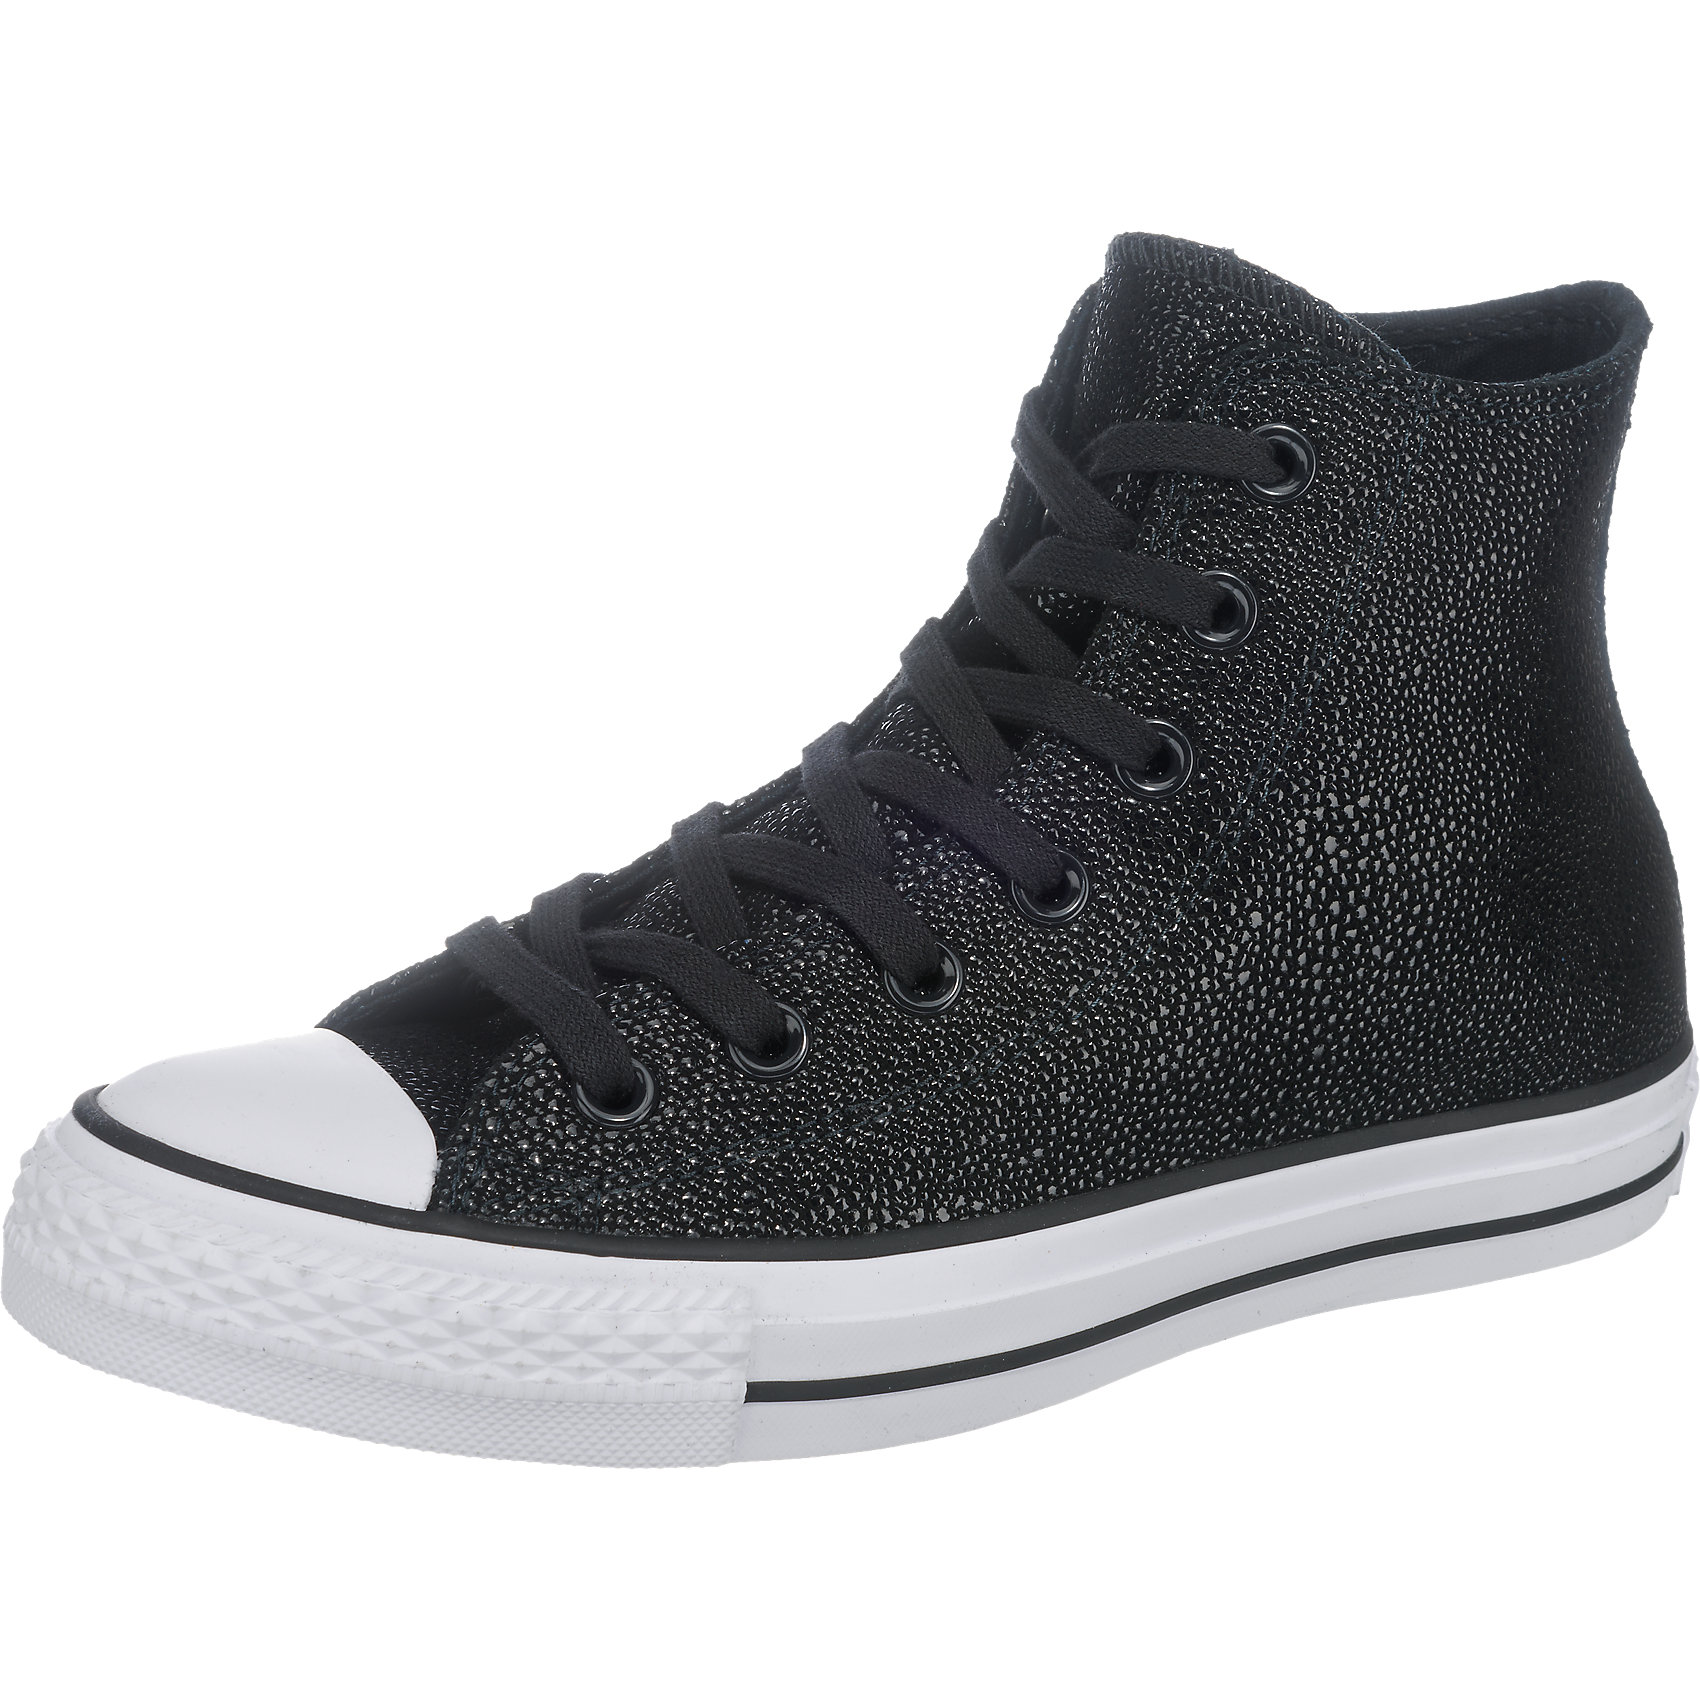 Neu CONVERSE Chuck Taylor All Star Leder Sneakers schwarz schwarz schwarz 5757603 f17b1d